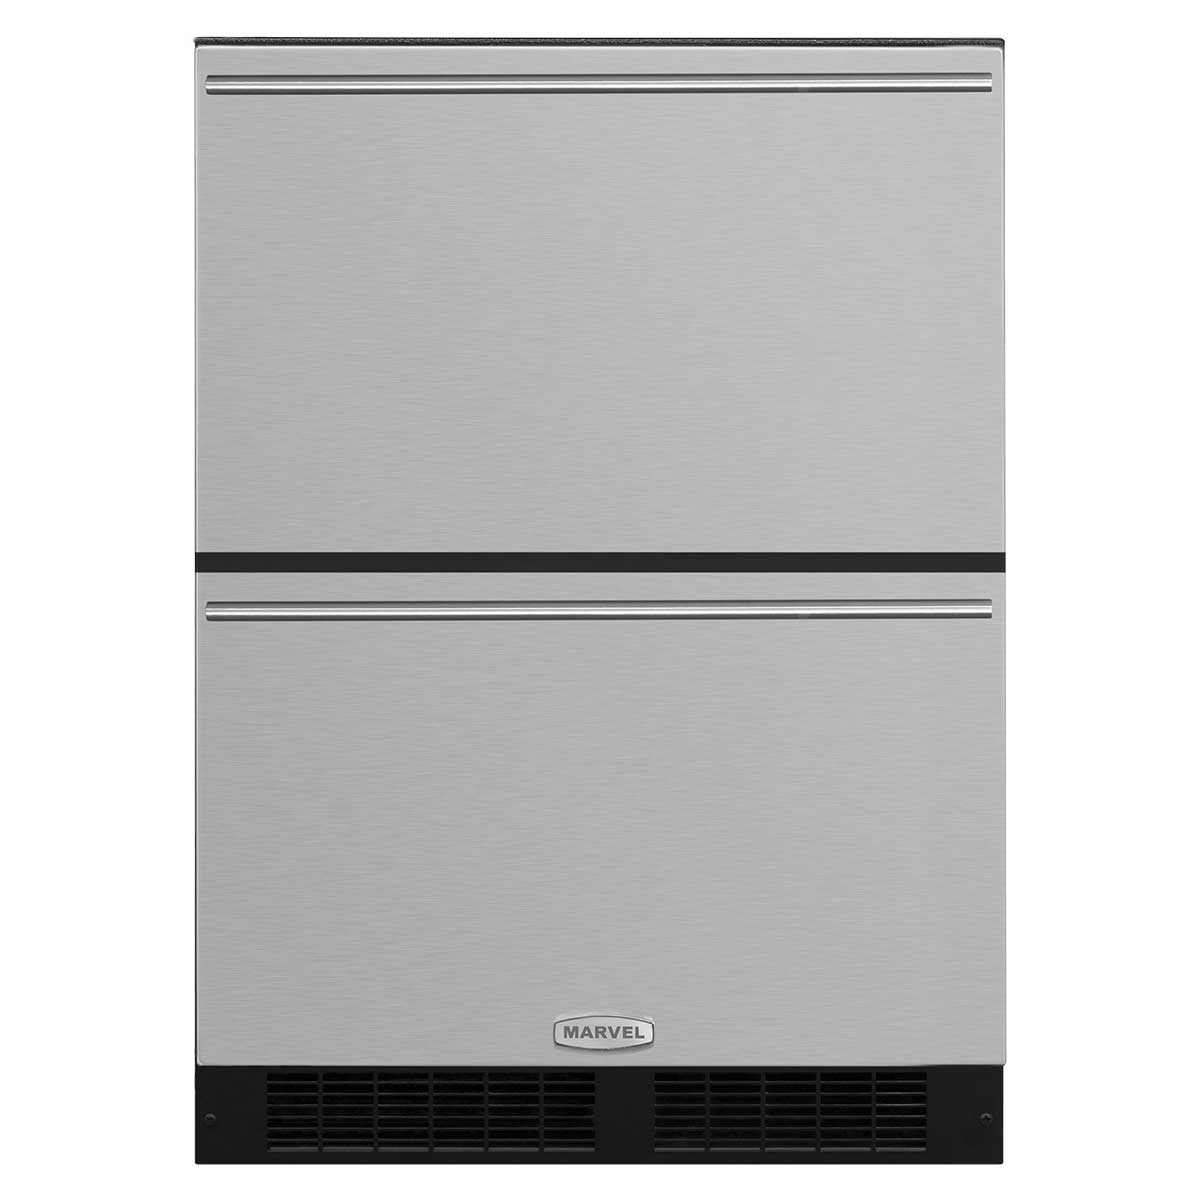 "Model: ML24RDS3NB | Marvel  Marvel 24"" Refrigerated Drawers-Solid Black Drawer Front, Black Handles"